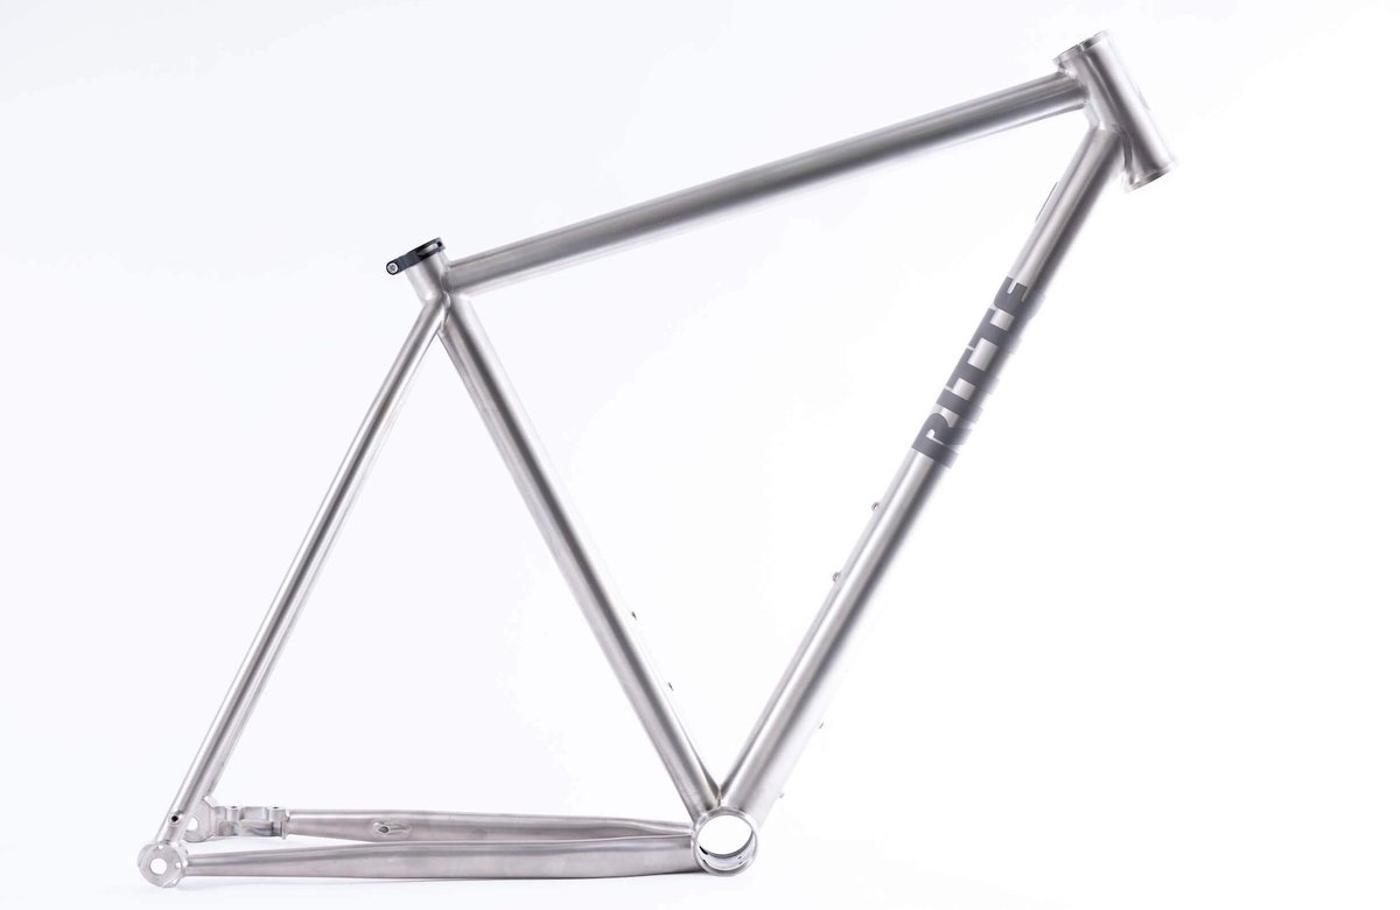 Ritte's Titanium MUSA Satyr 2.0 Was Designed by Tom Kellogg